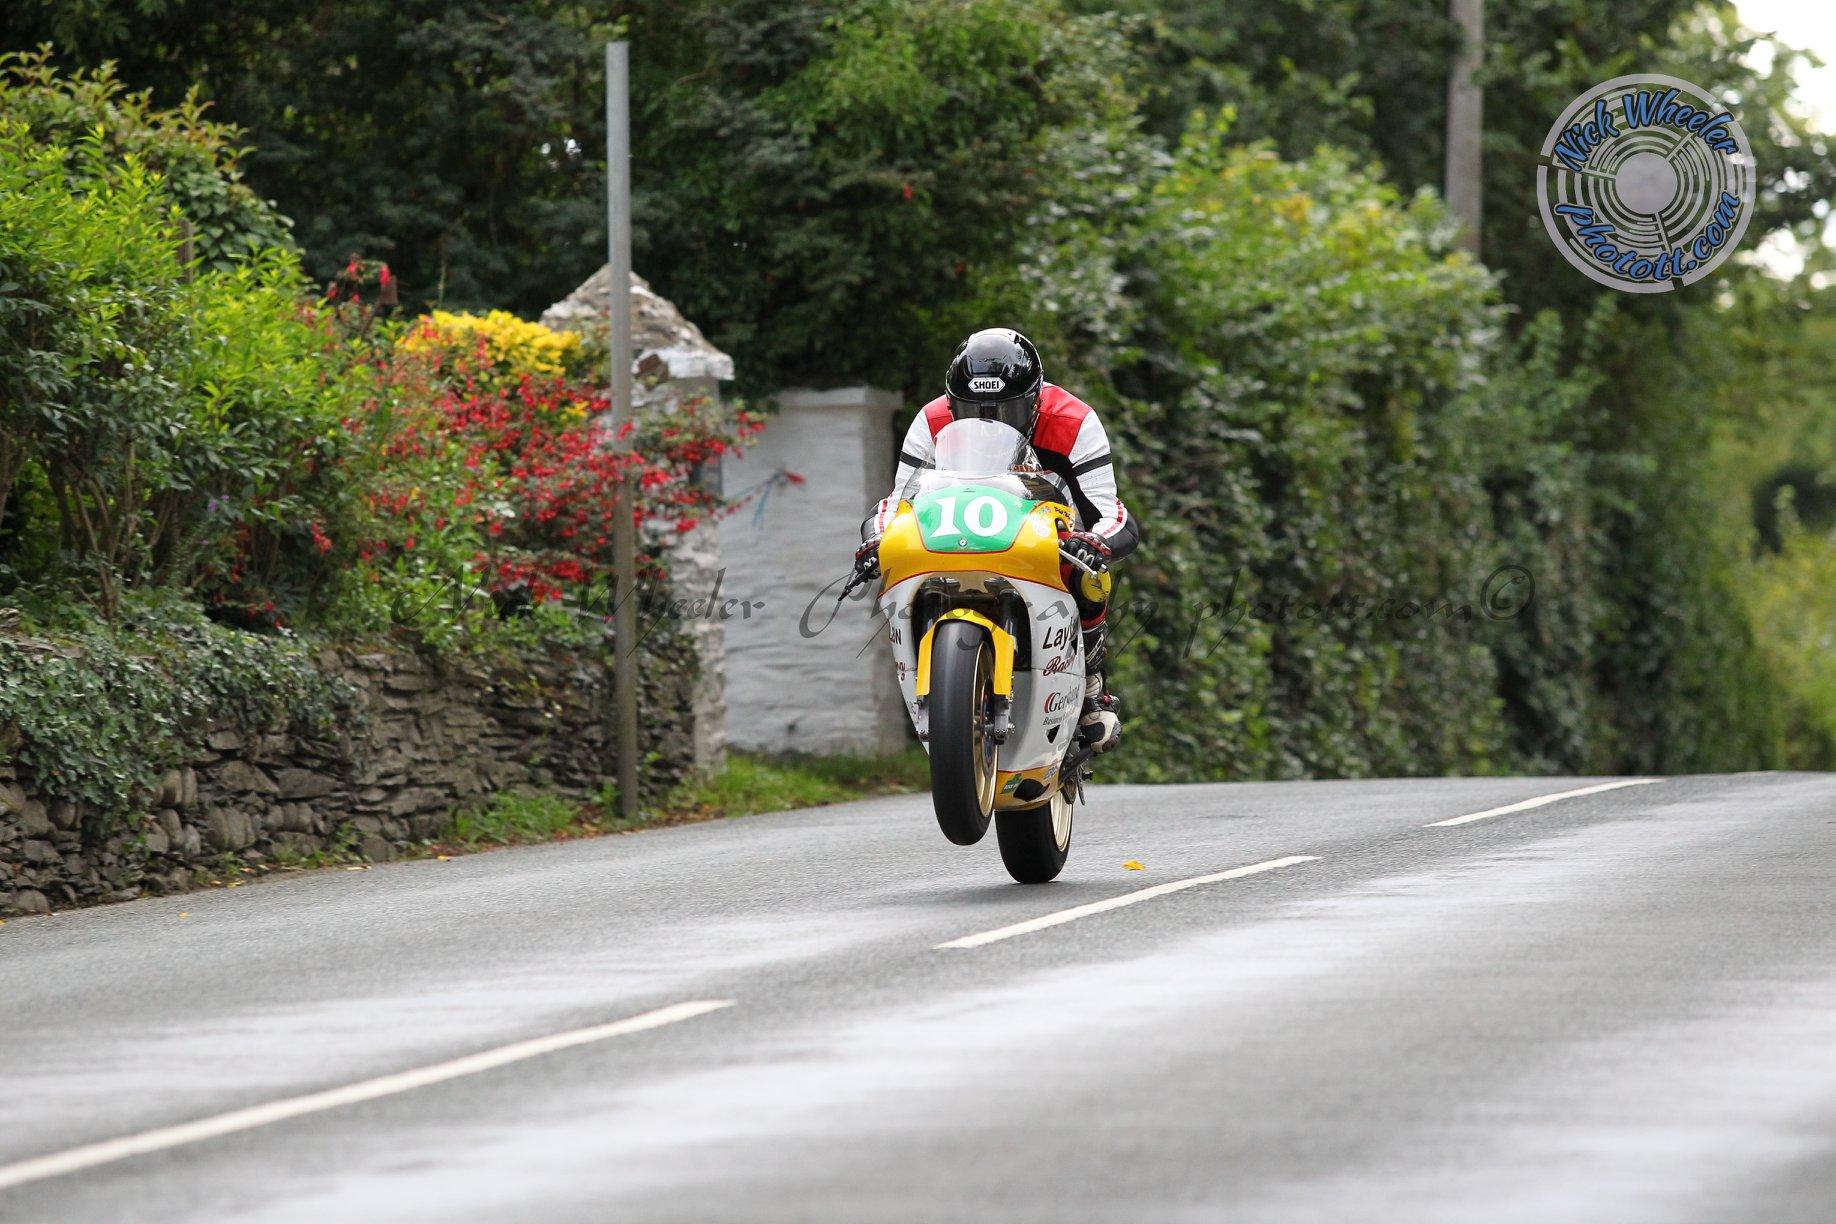 Classic TT: Laylaw Racing Confirm Three Rider Team As Harvey Joins TT Greats Harrison, Lougher